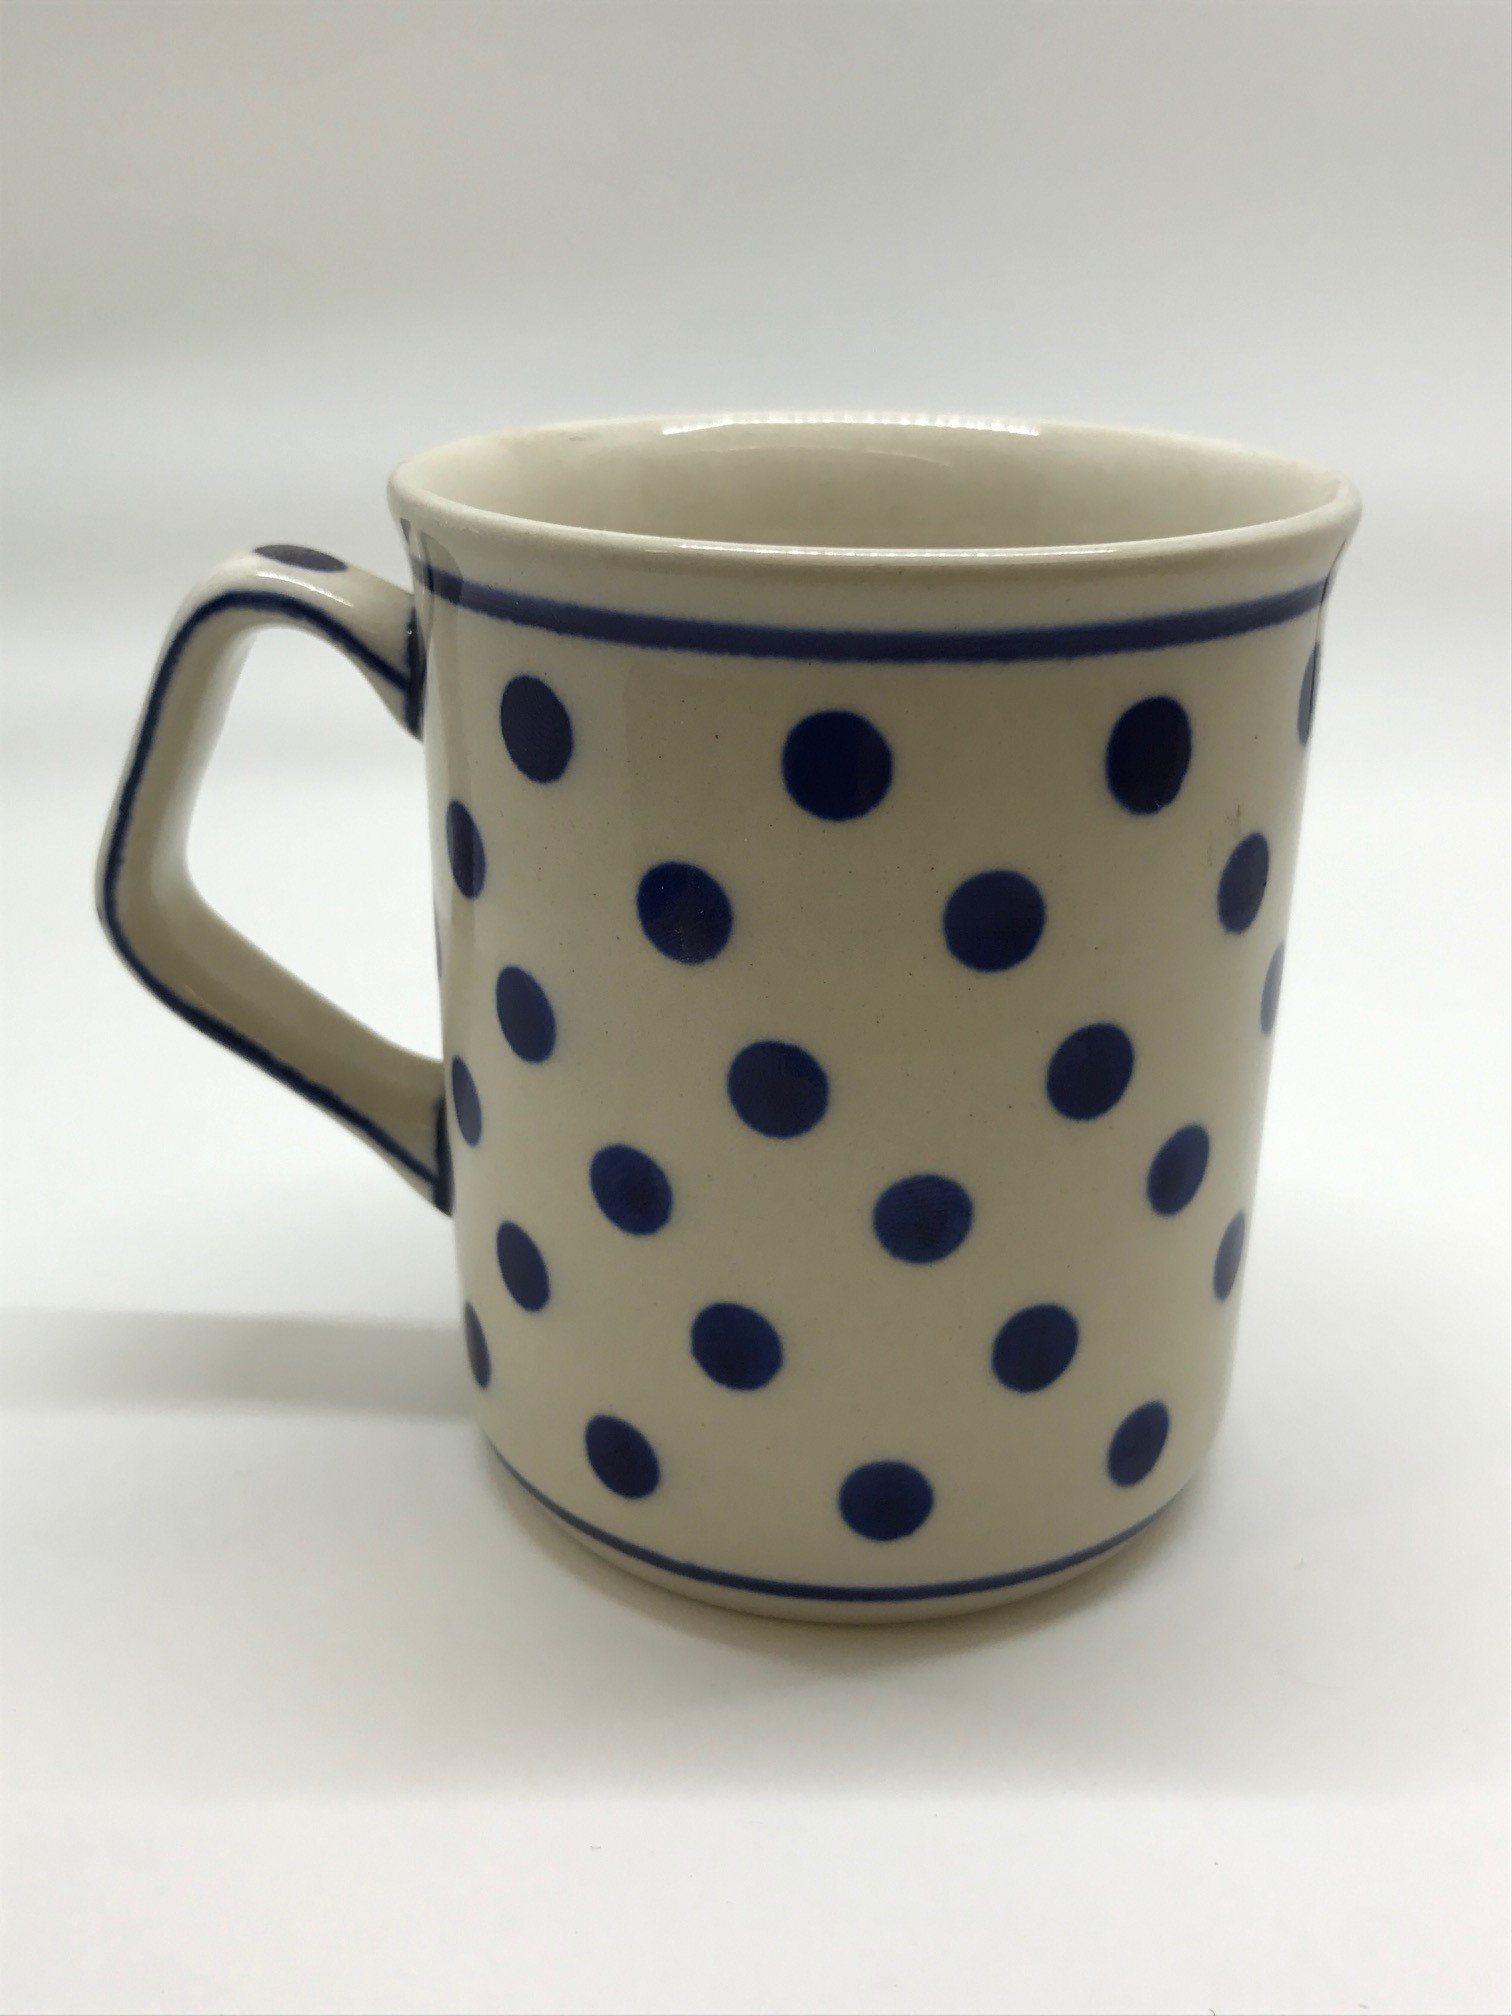 Polish Pottery Boleslawiec Mug, Small, Straight, 0.25L in DOTTY pattern